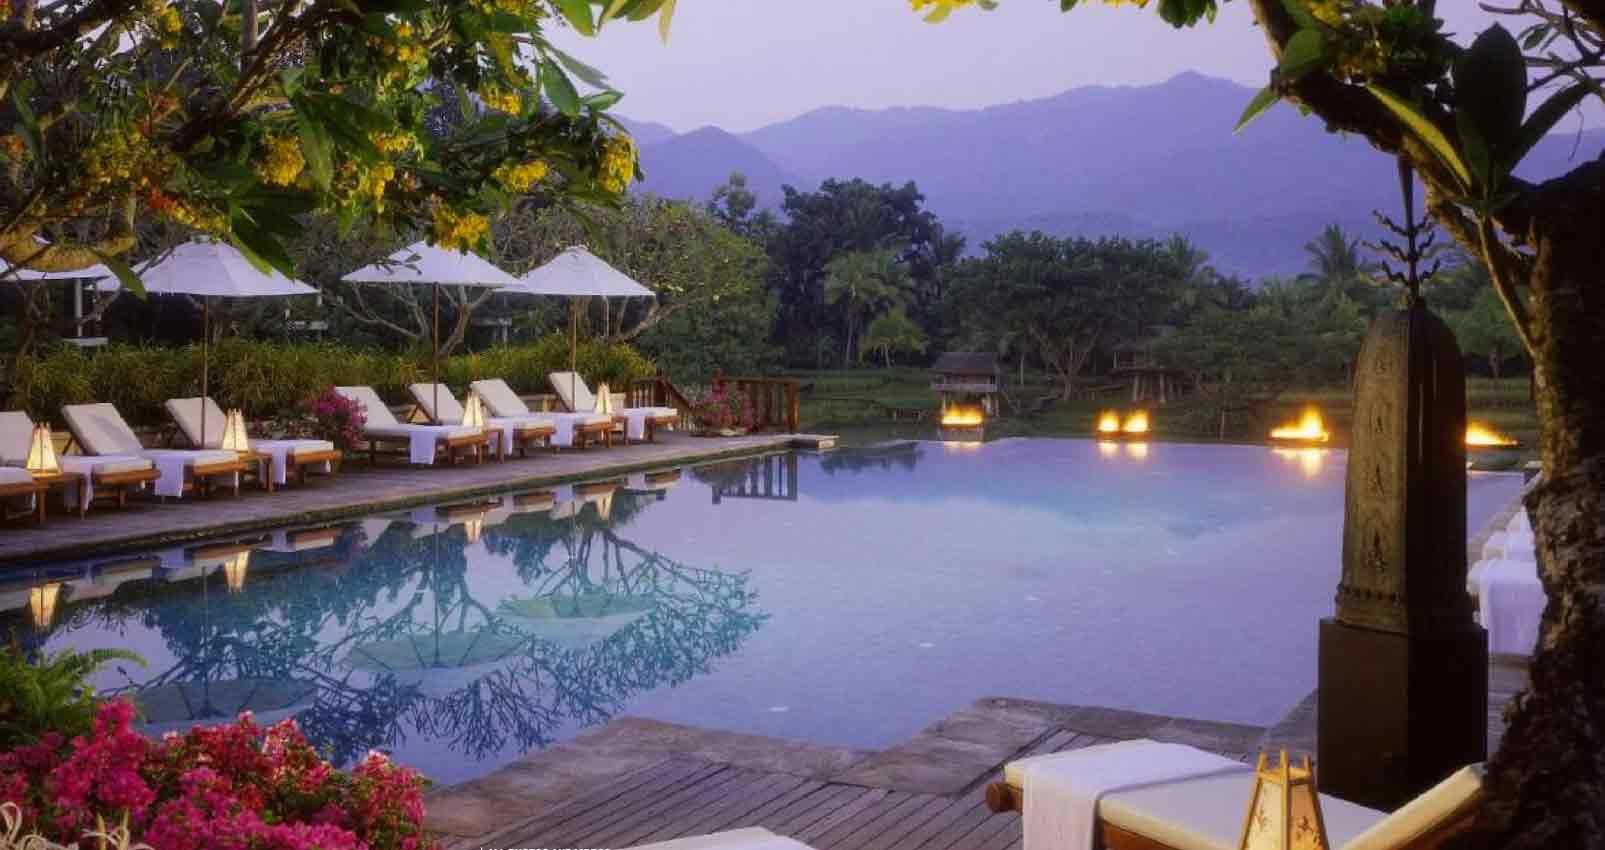 Four-seasons-chiang-mai-pool-smart-family-travel